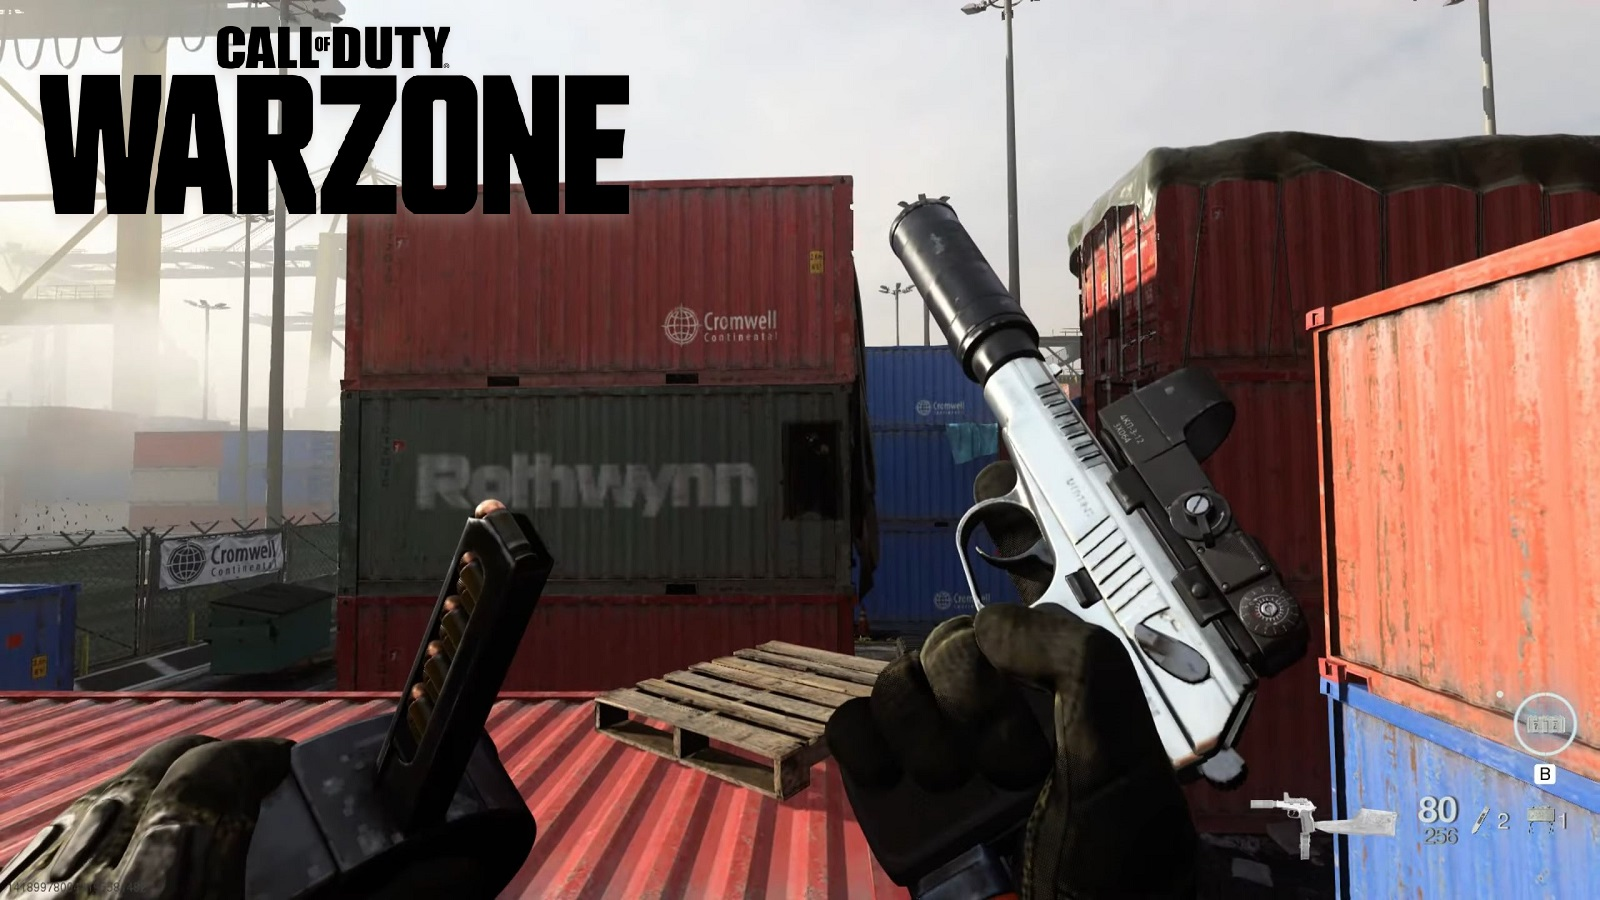 Call of Duty Warzone Modern Warfare Sykov Pistol With Logo